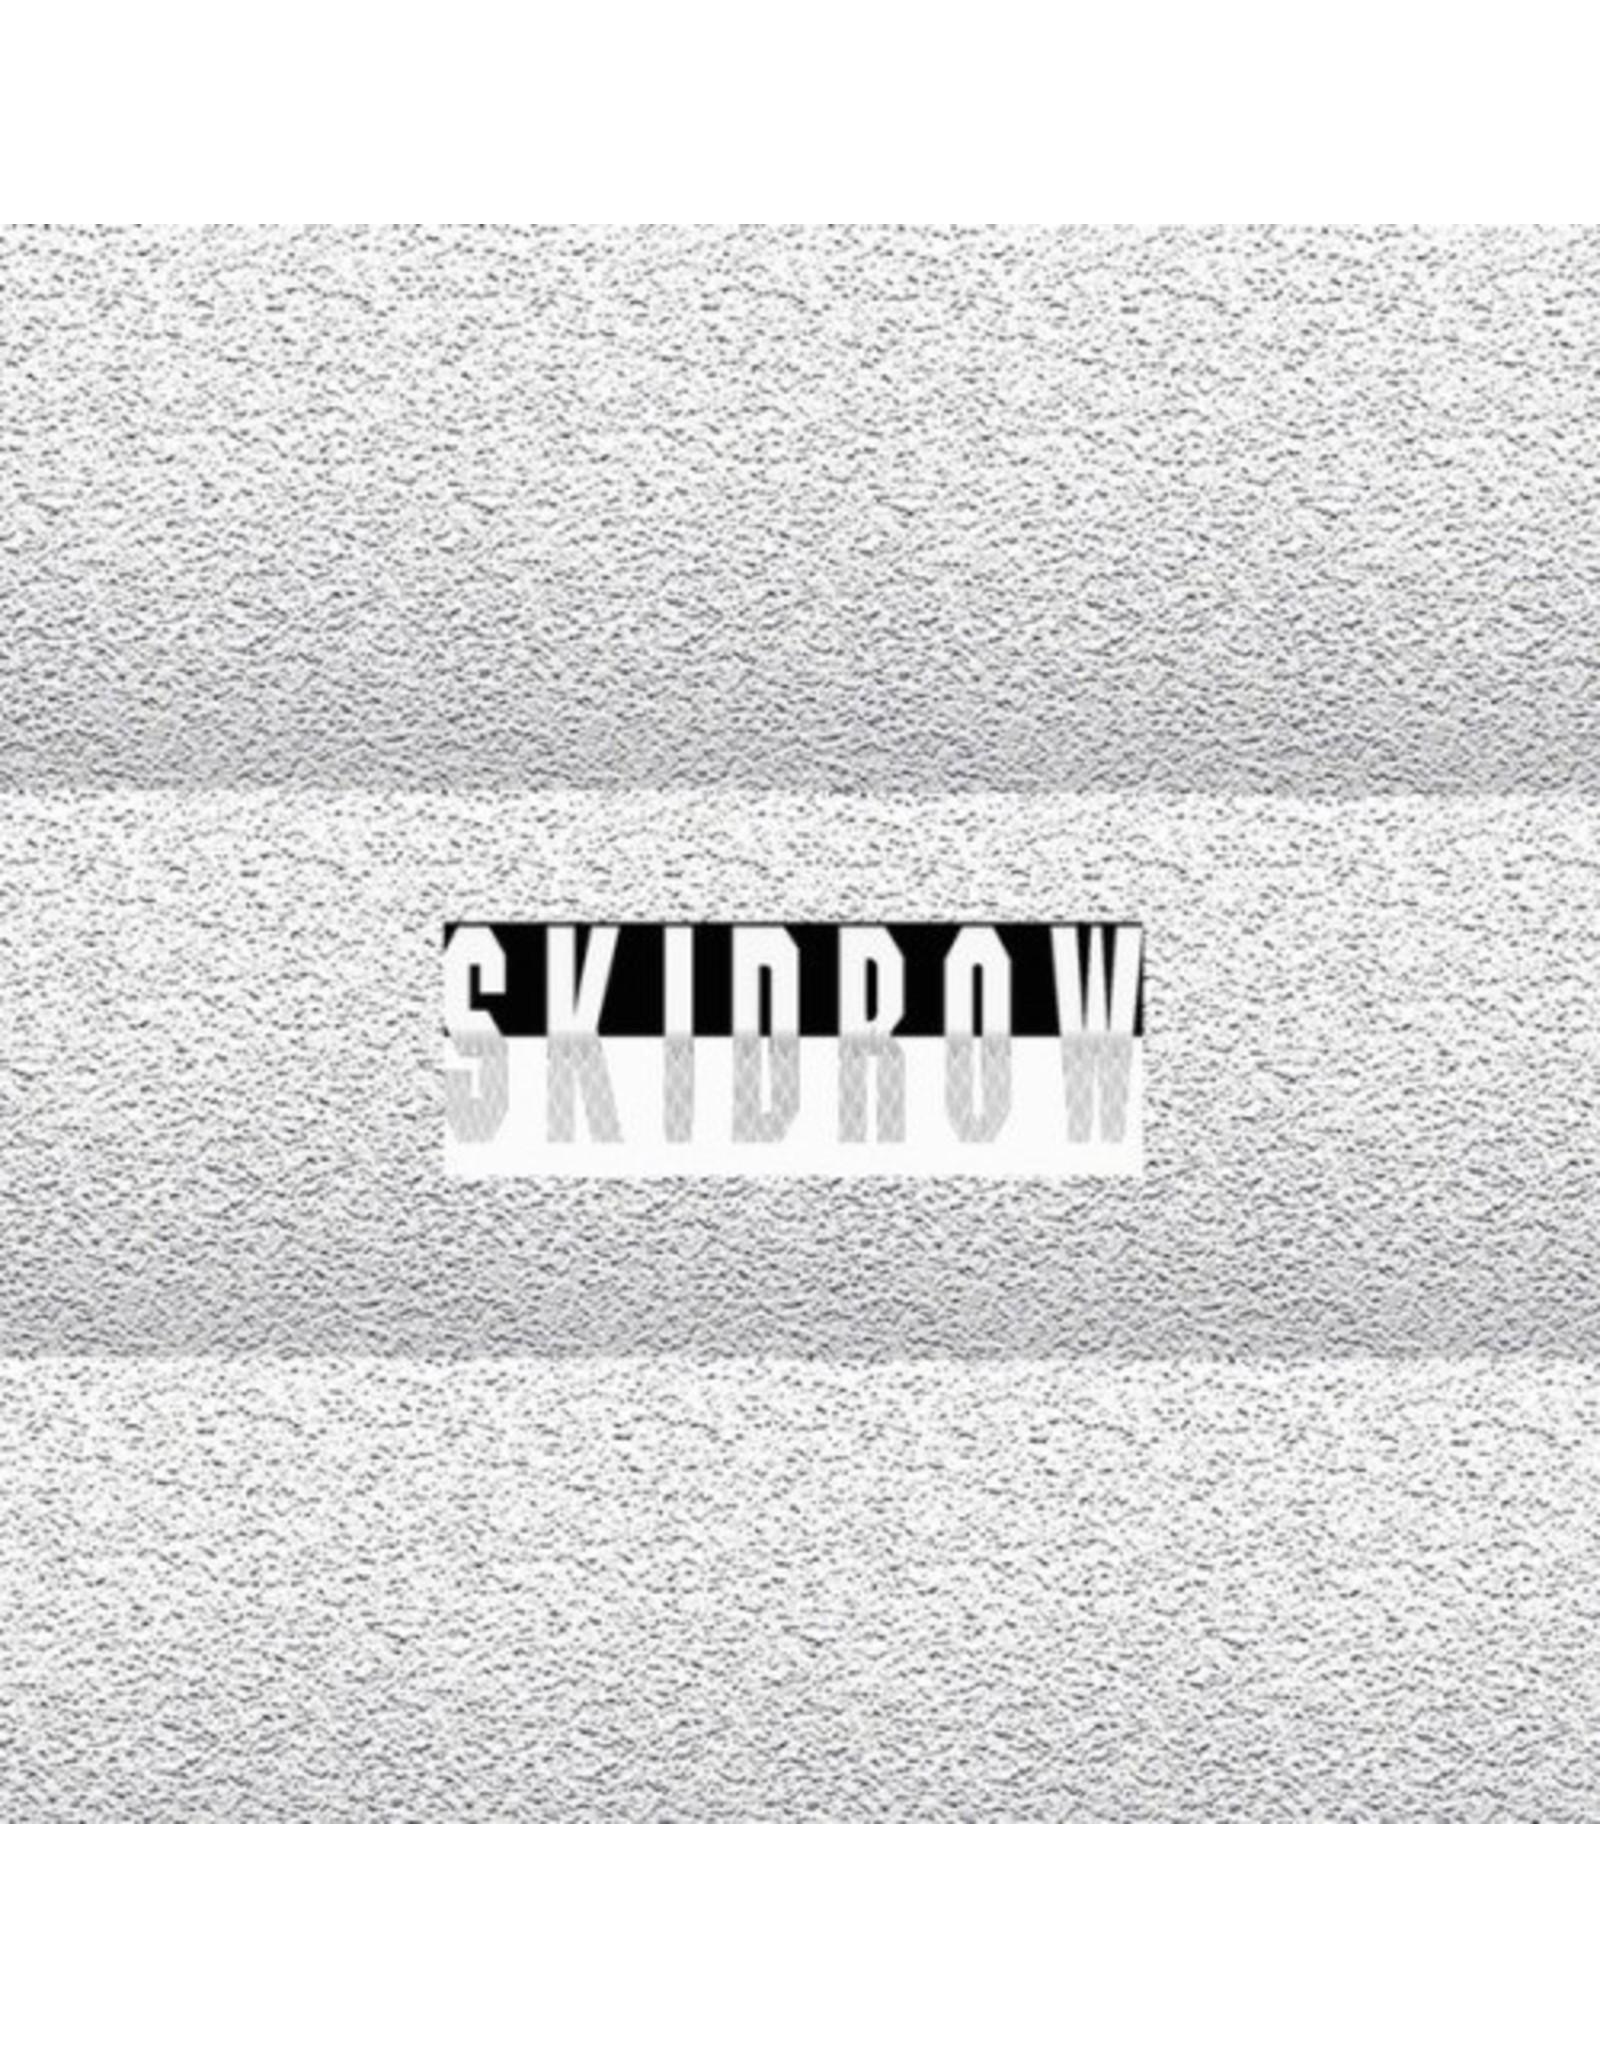 New Vinyl James Ferraro - Skid Row 2LP